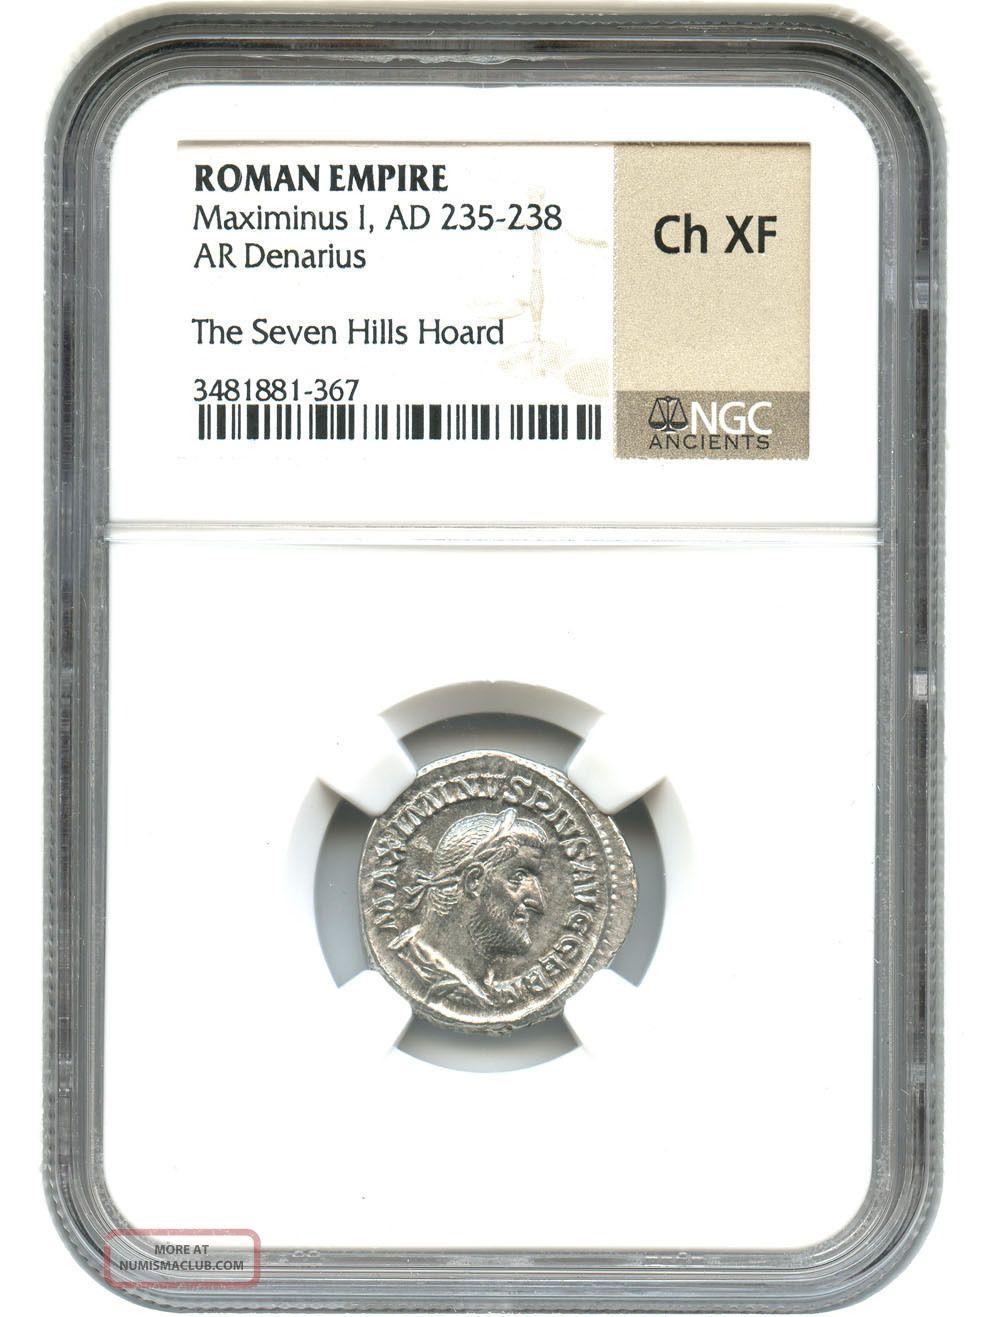 Ad 235 - 238 Maximinus I Ar Denarius Ngc Choice Xf (roman Empire) Coins: Ancient photo